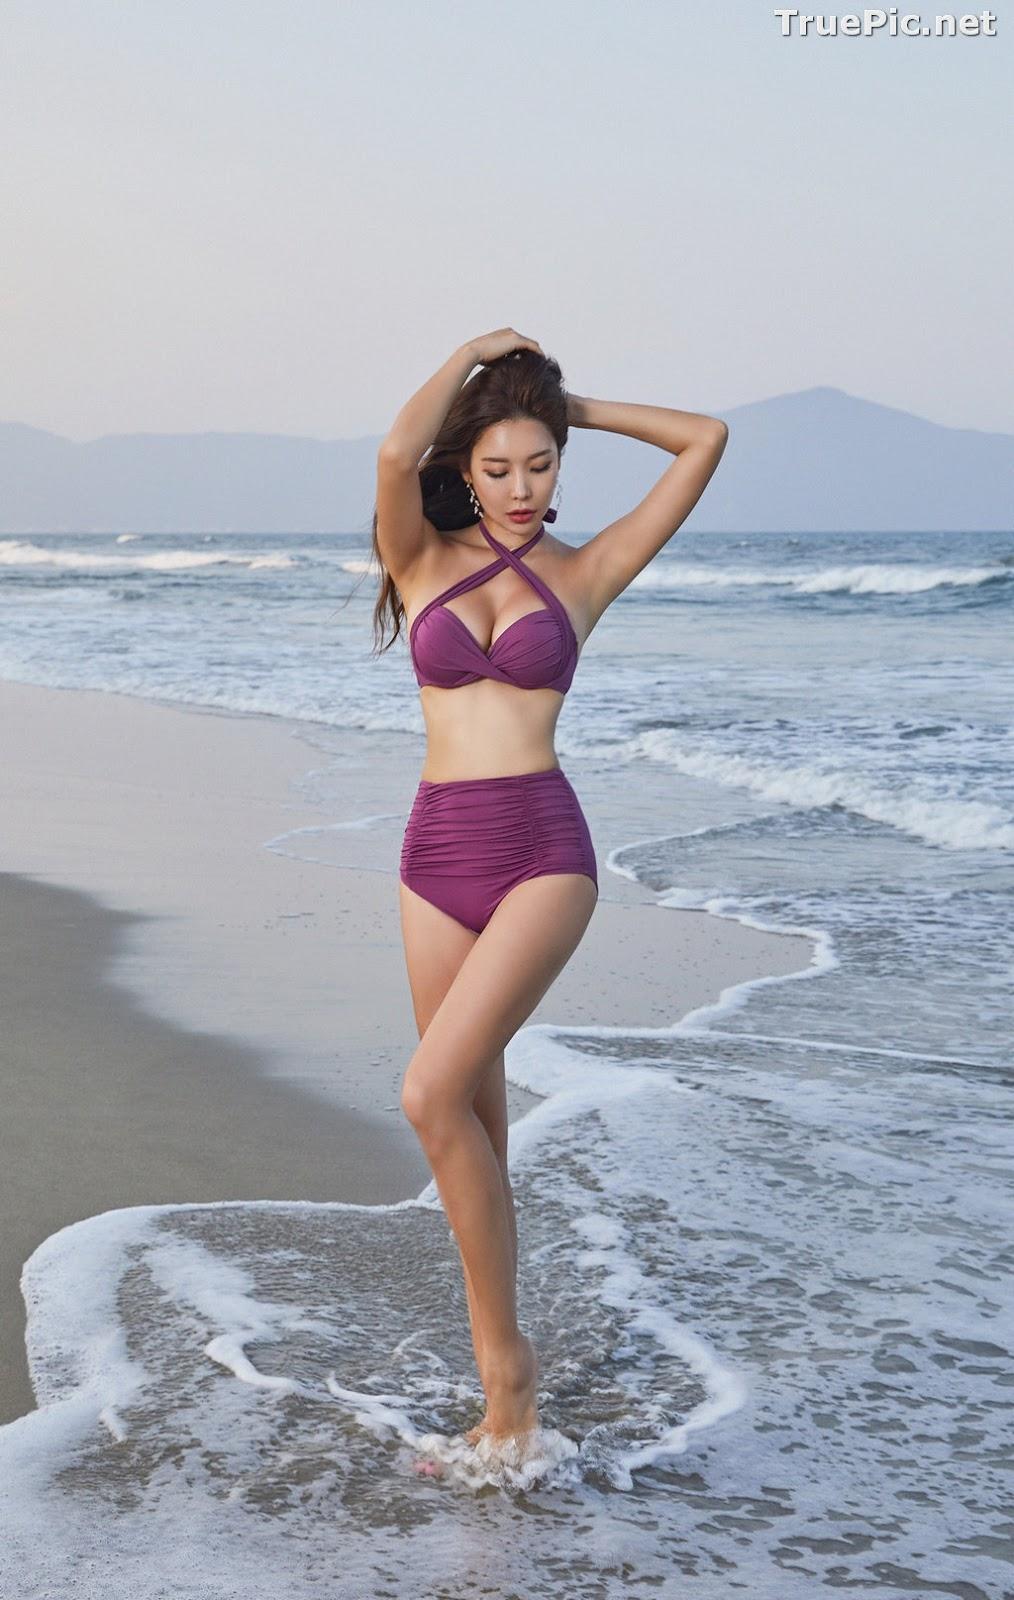 Image Park Da Hyun - Korean Fashion Model - RoseMellow Purple Bikini - TruePic.net - Picture-9